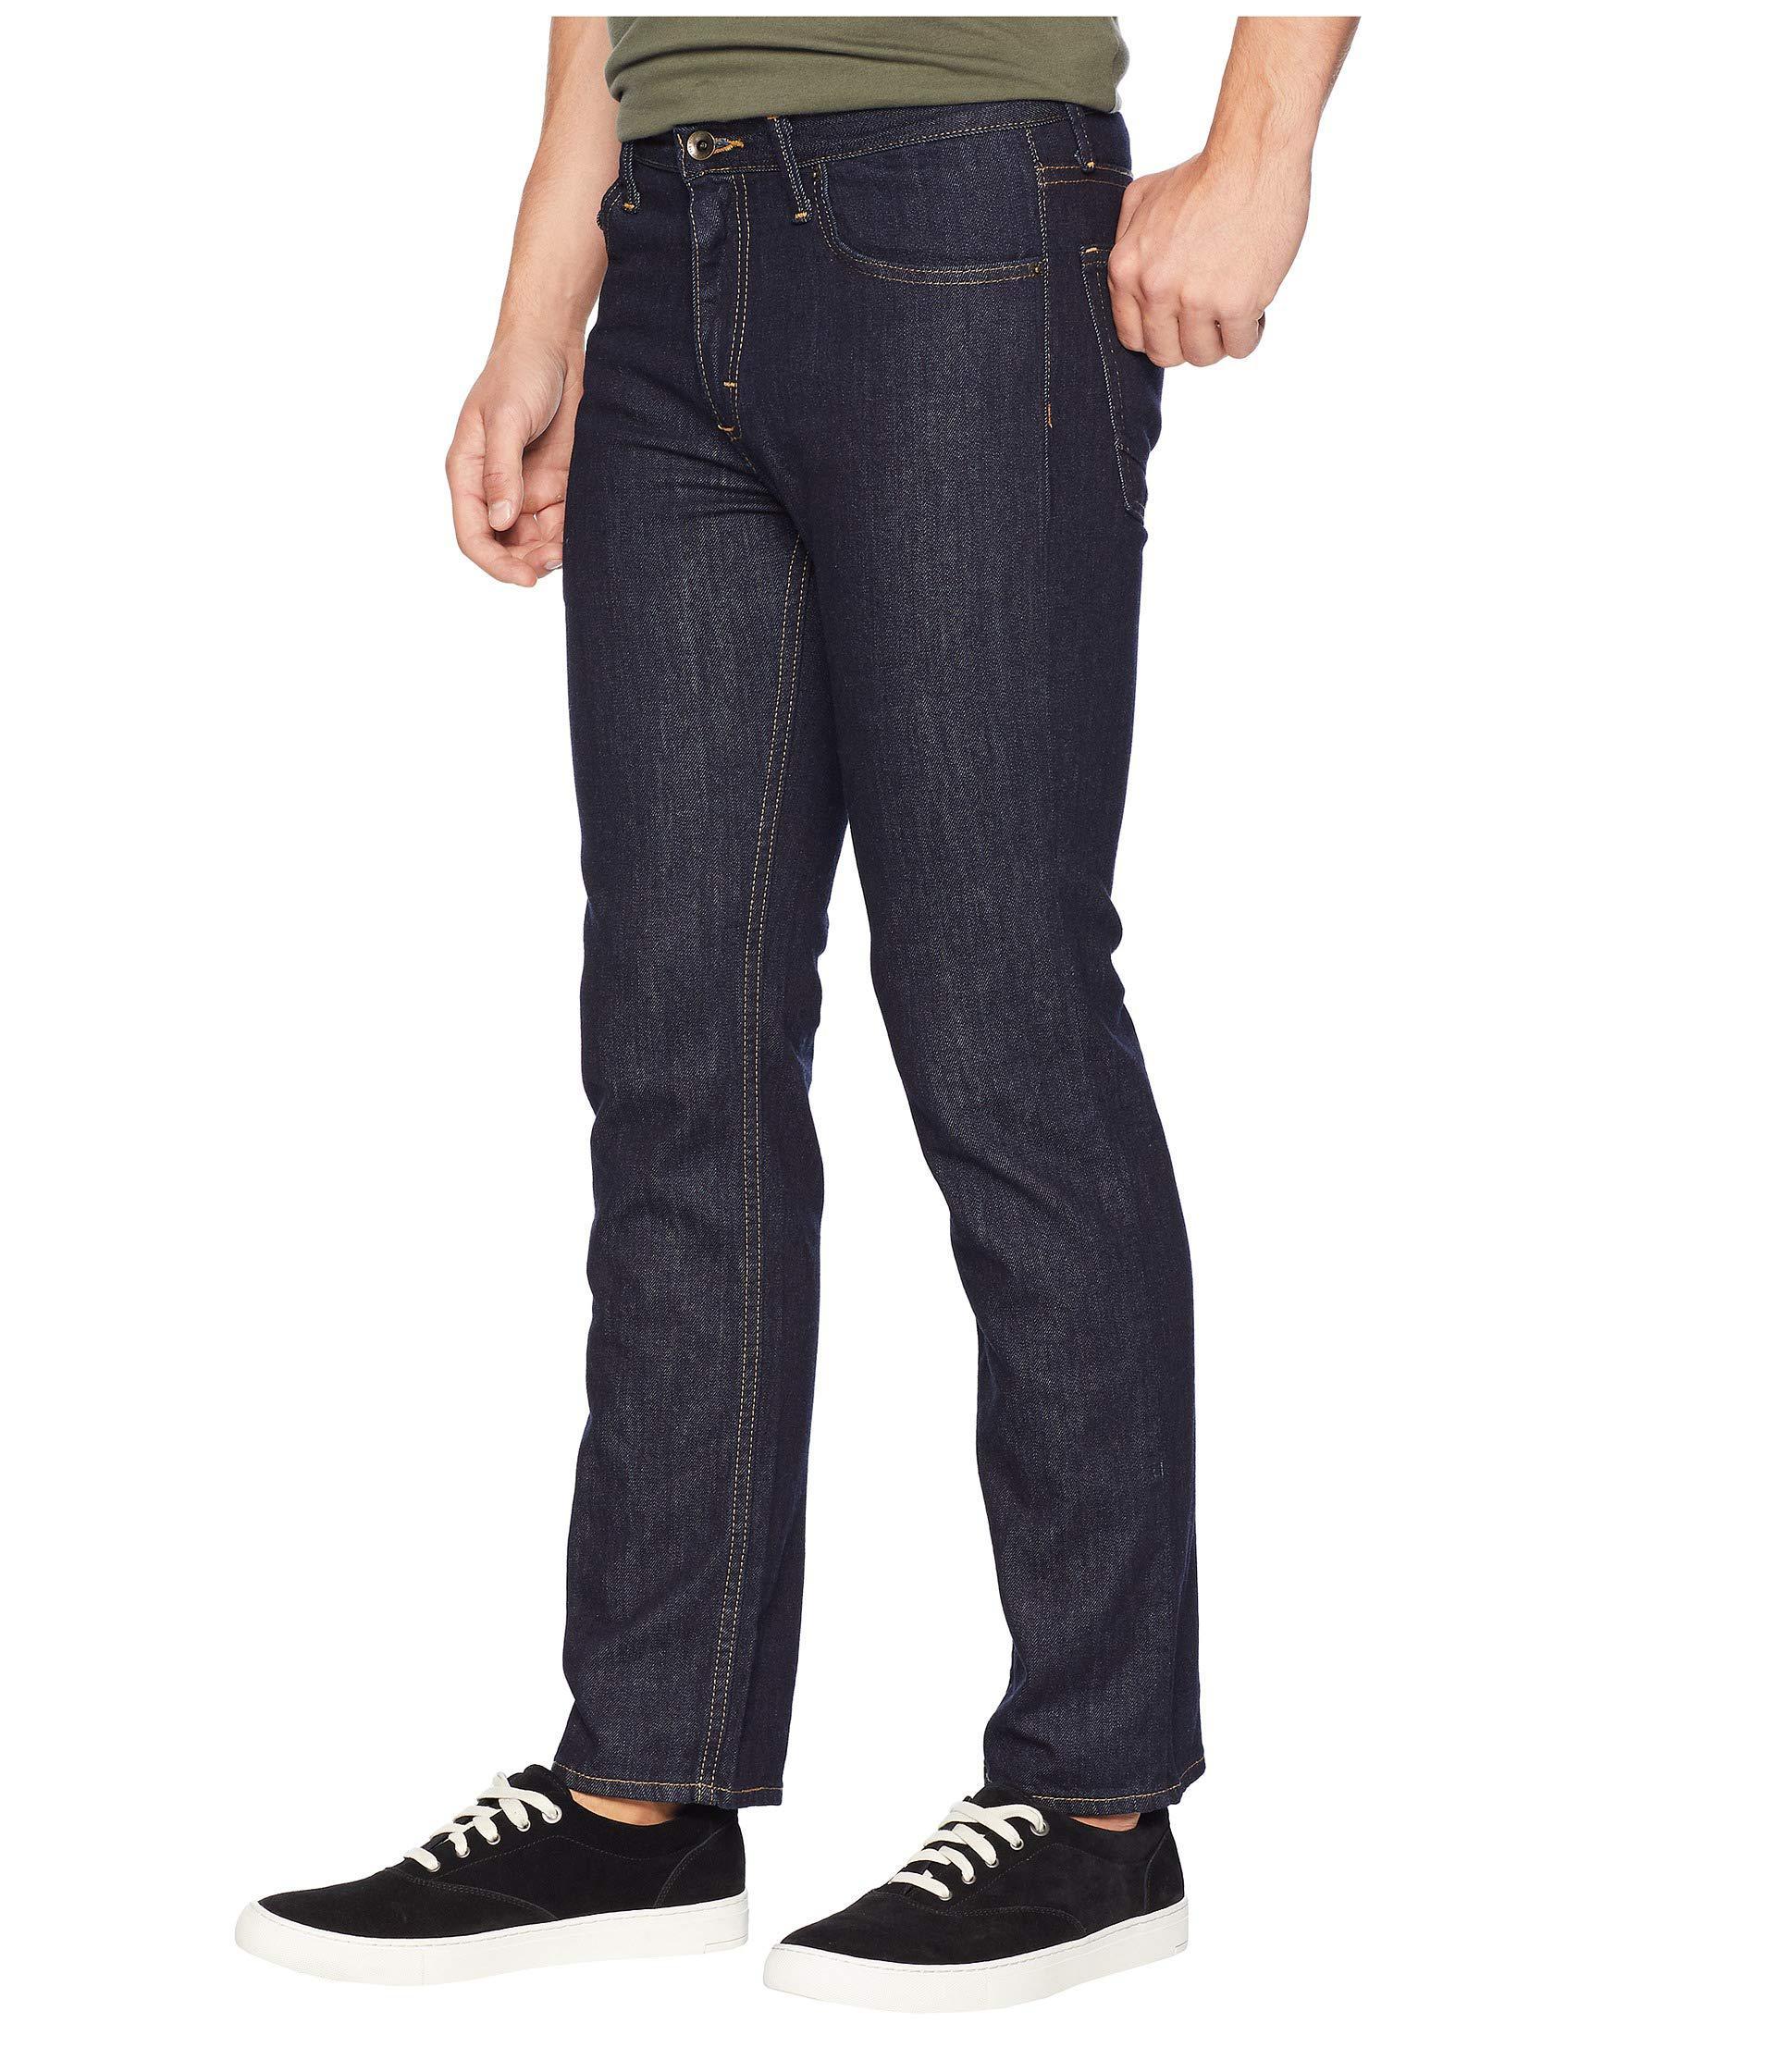 6aca00ee3d3367 Lyst - Vans V16 Slim Jeans In Indigo (indigo) Men s Jeans in Blue ...